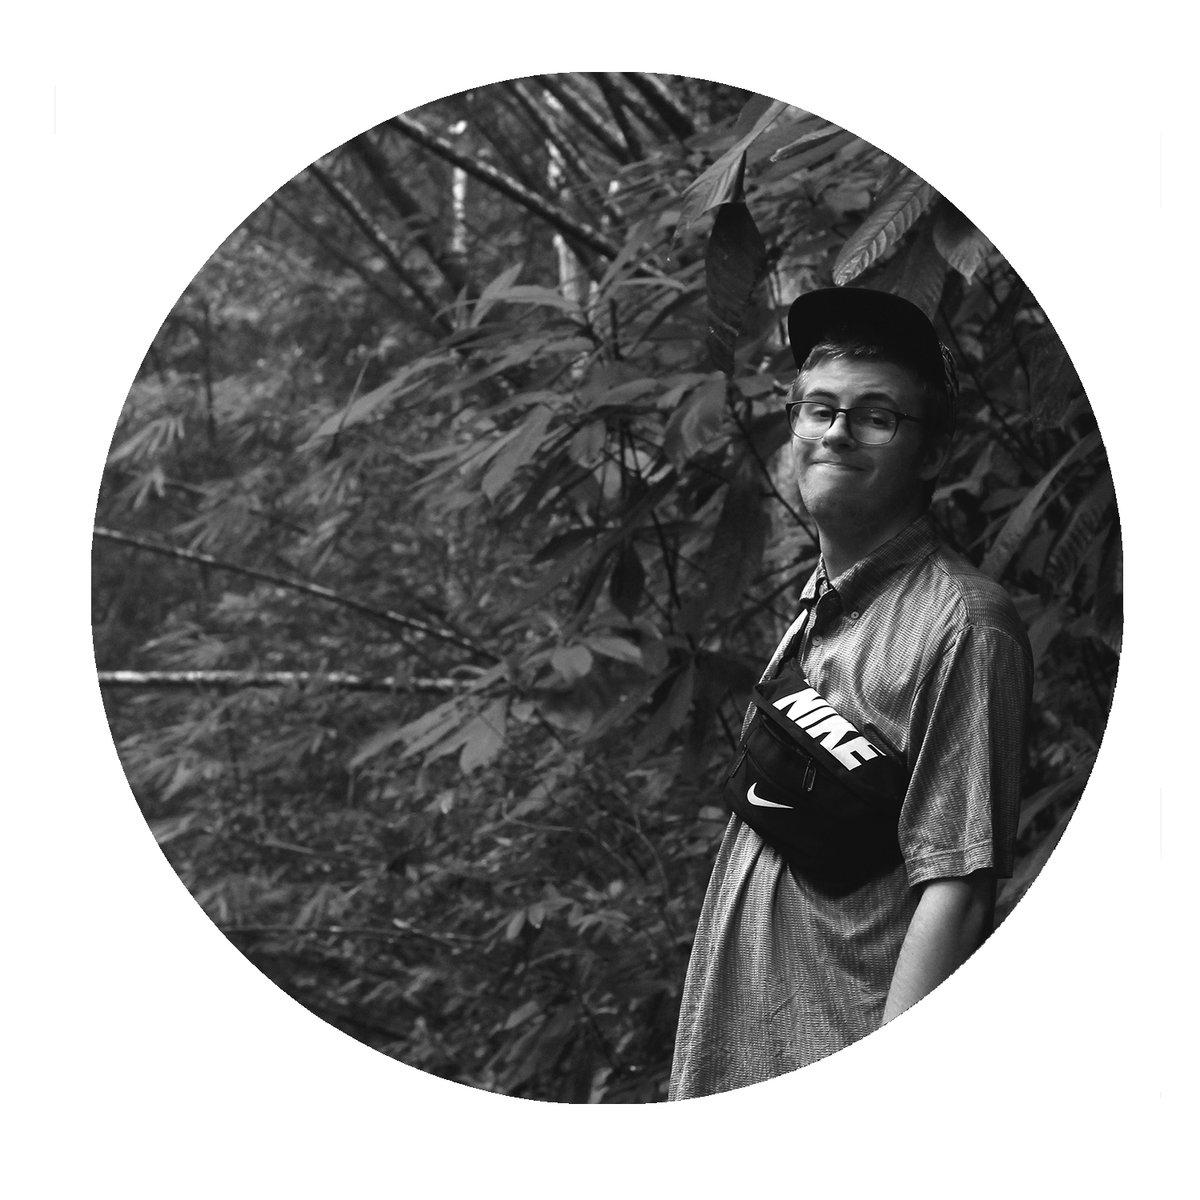 LK aka Lee Konitz